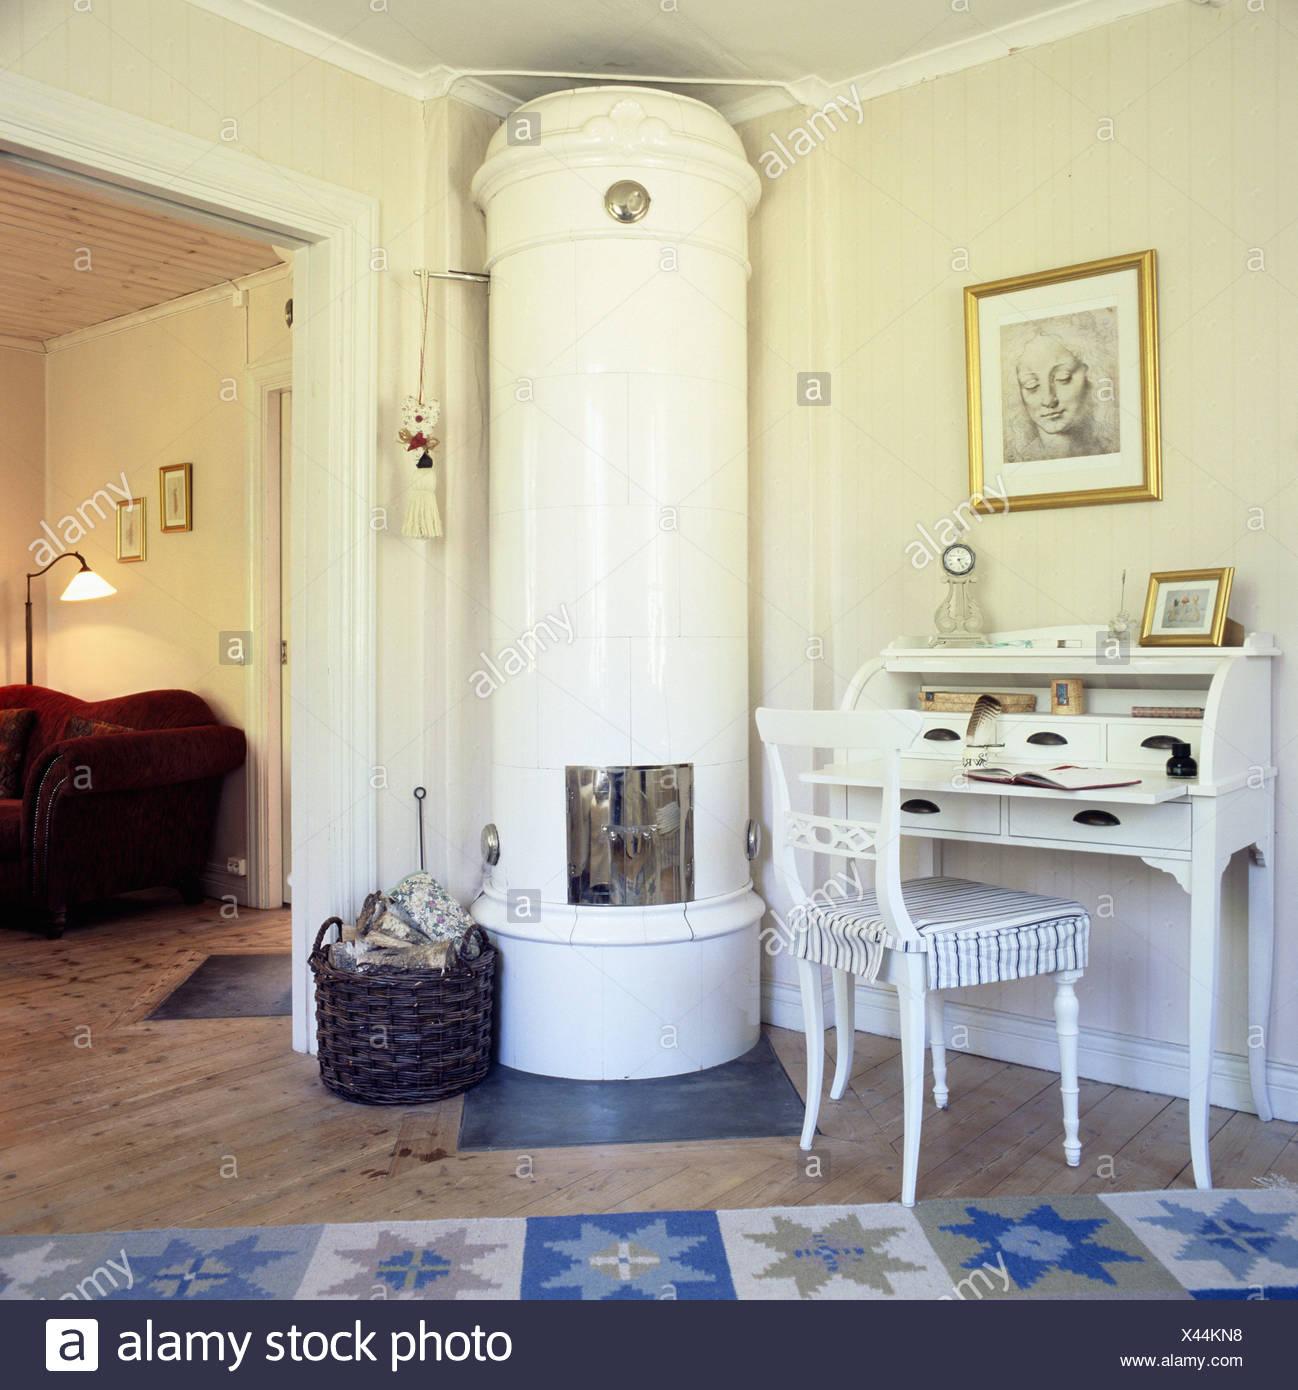 Swedish Cottage Interior Stock Photos & Swedish Cottage Interior ...